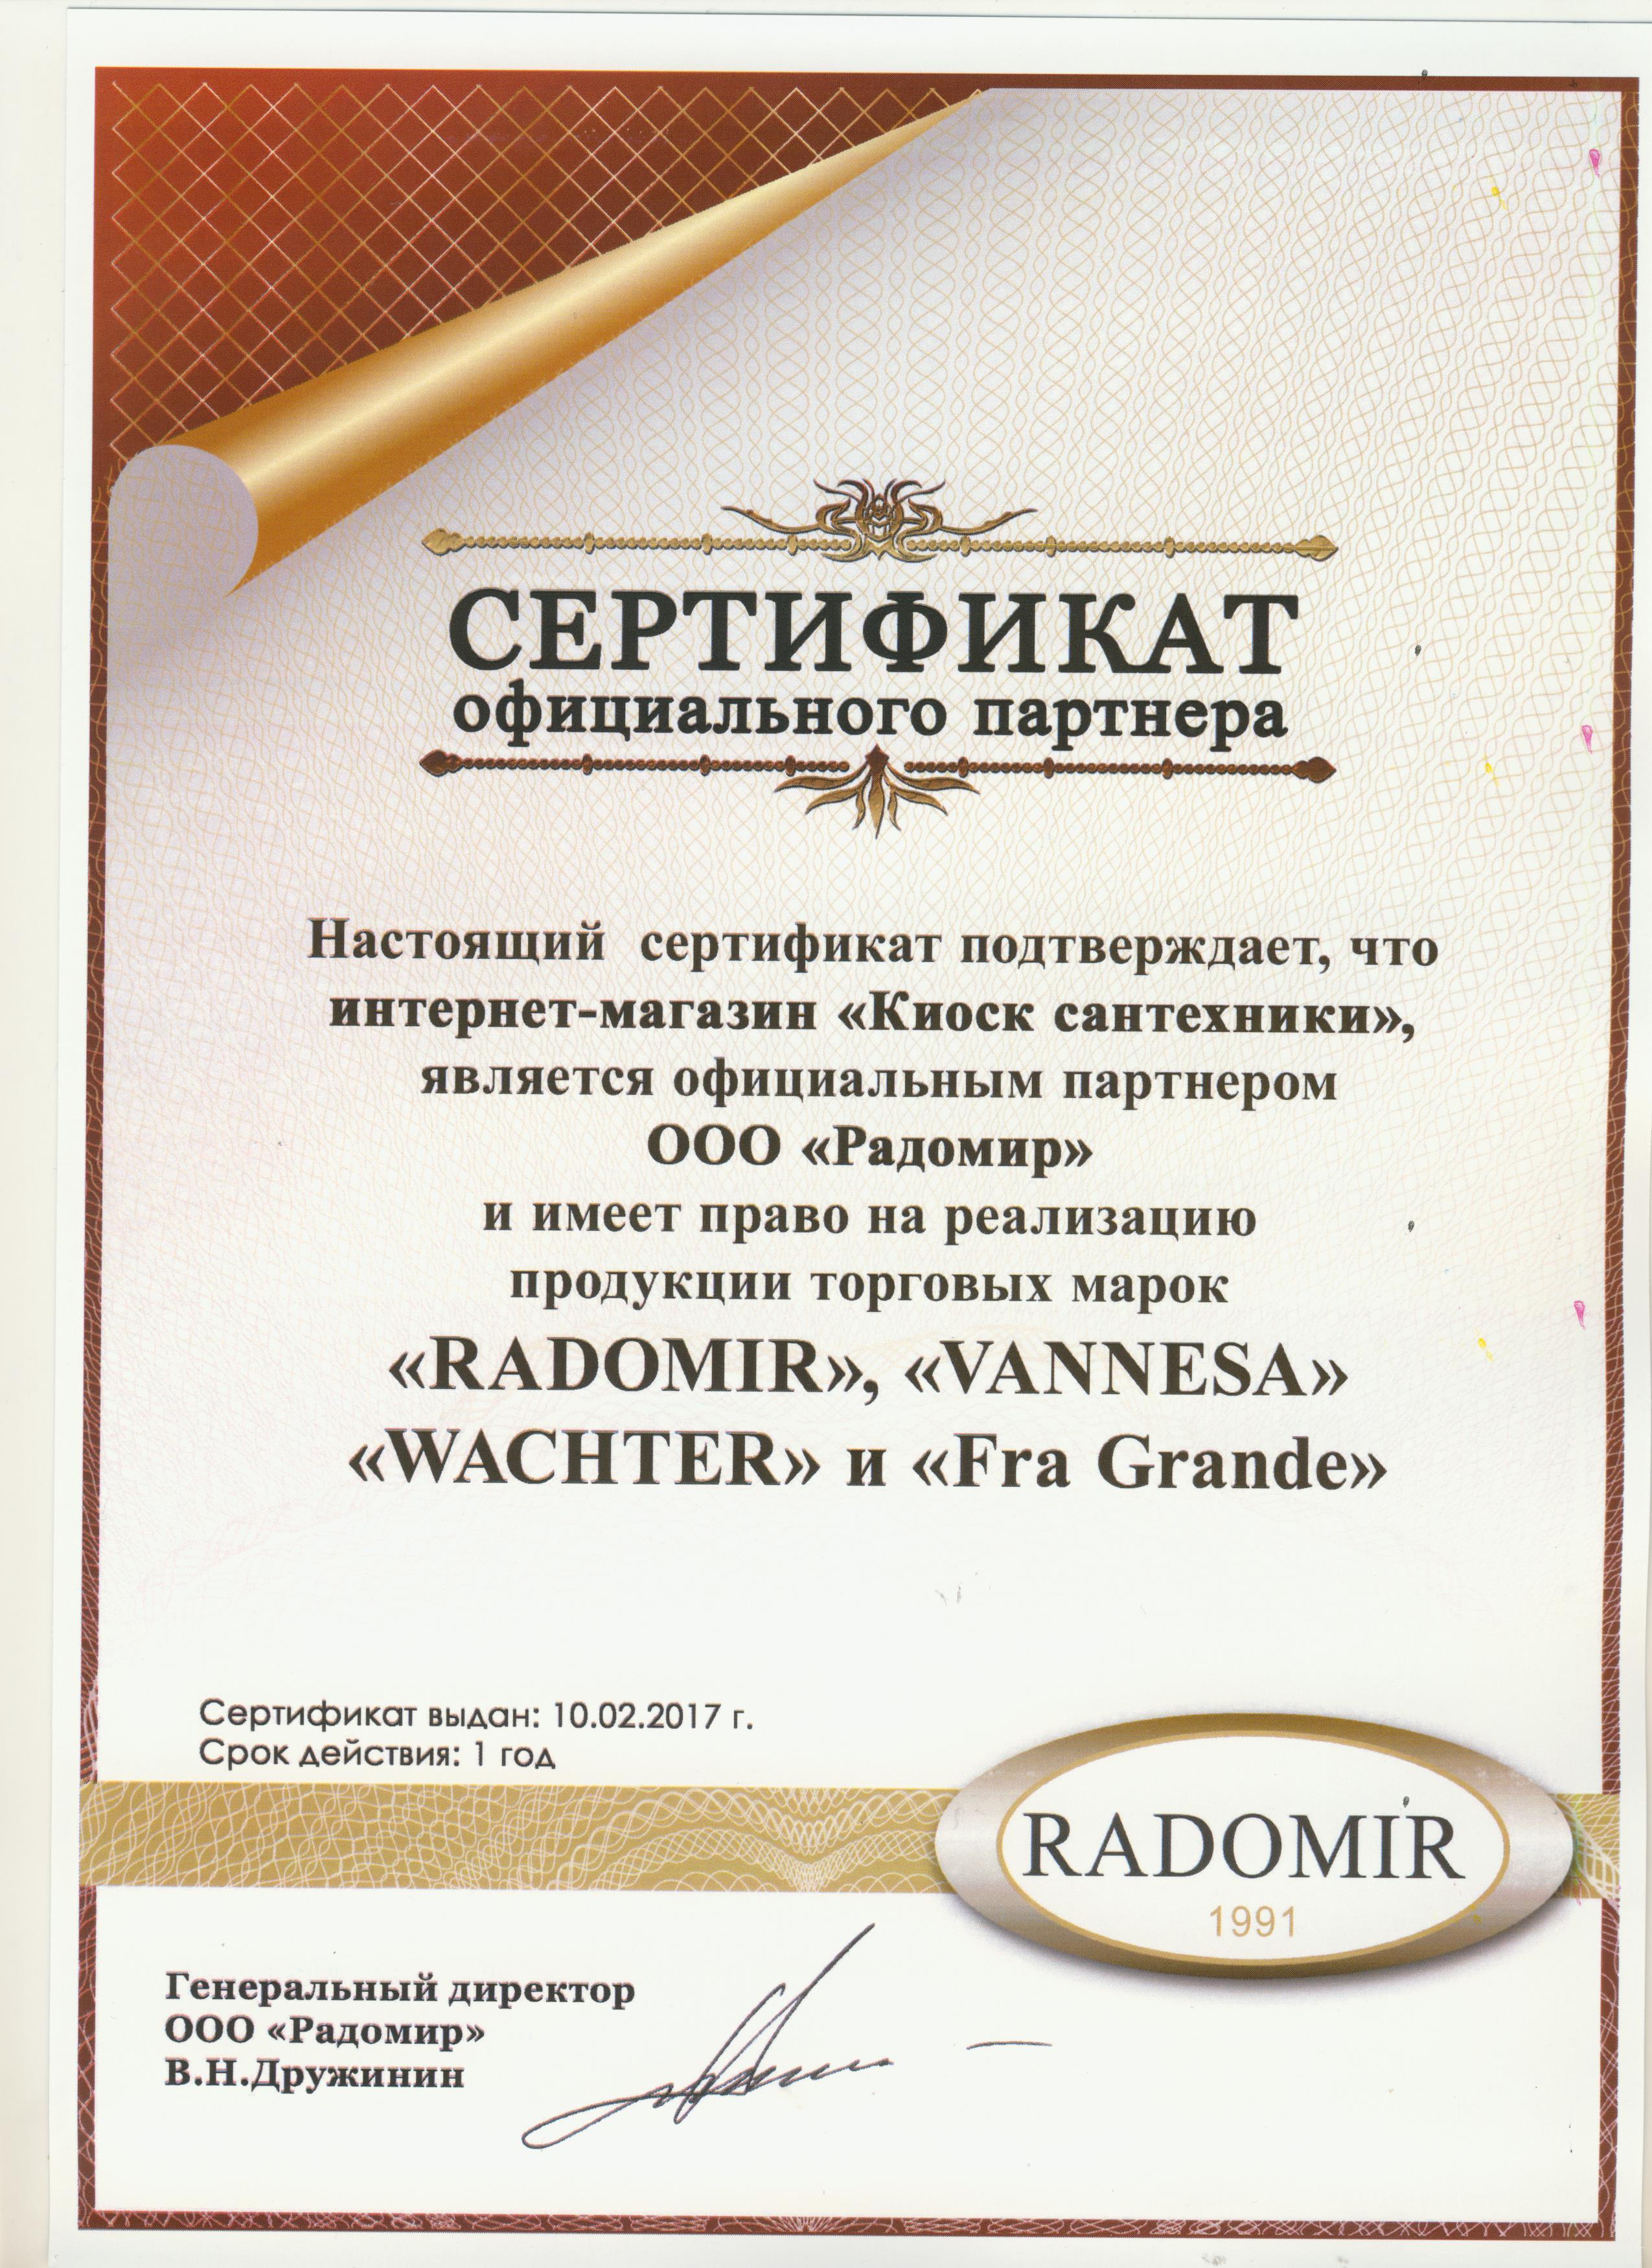 Фото 2008: Душевой бокс Радомир (Radomir) Вирсавия